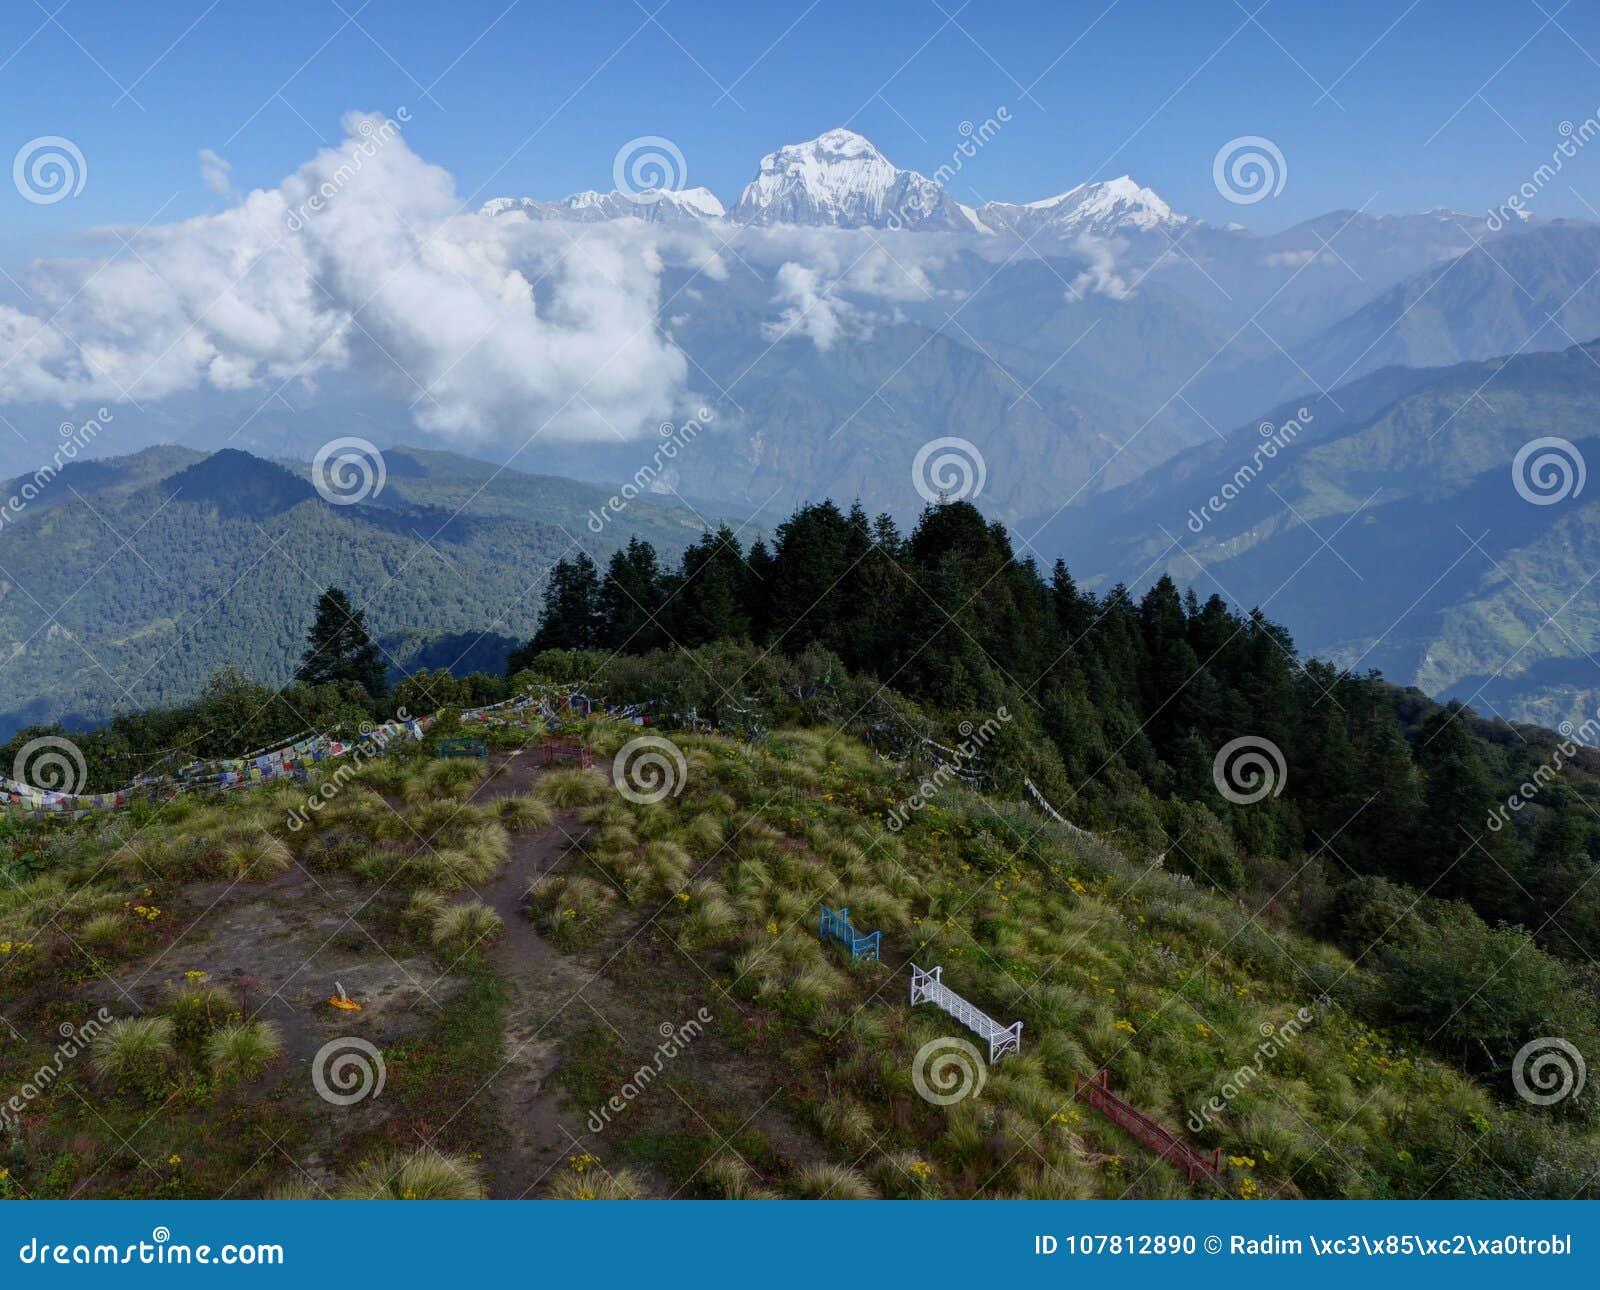 Dhaulagiri range from Poon Hill, Nepal